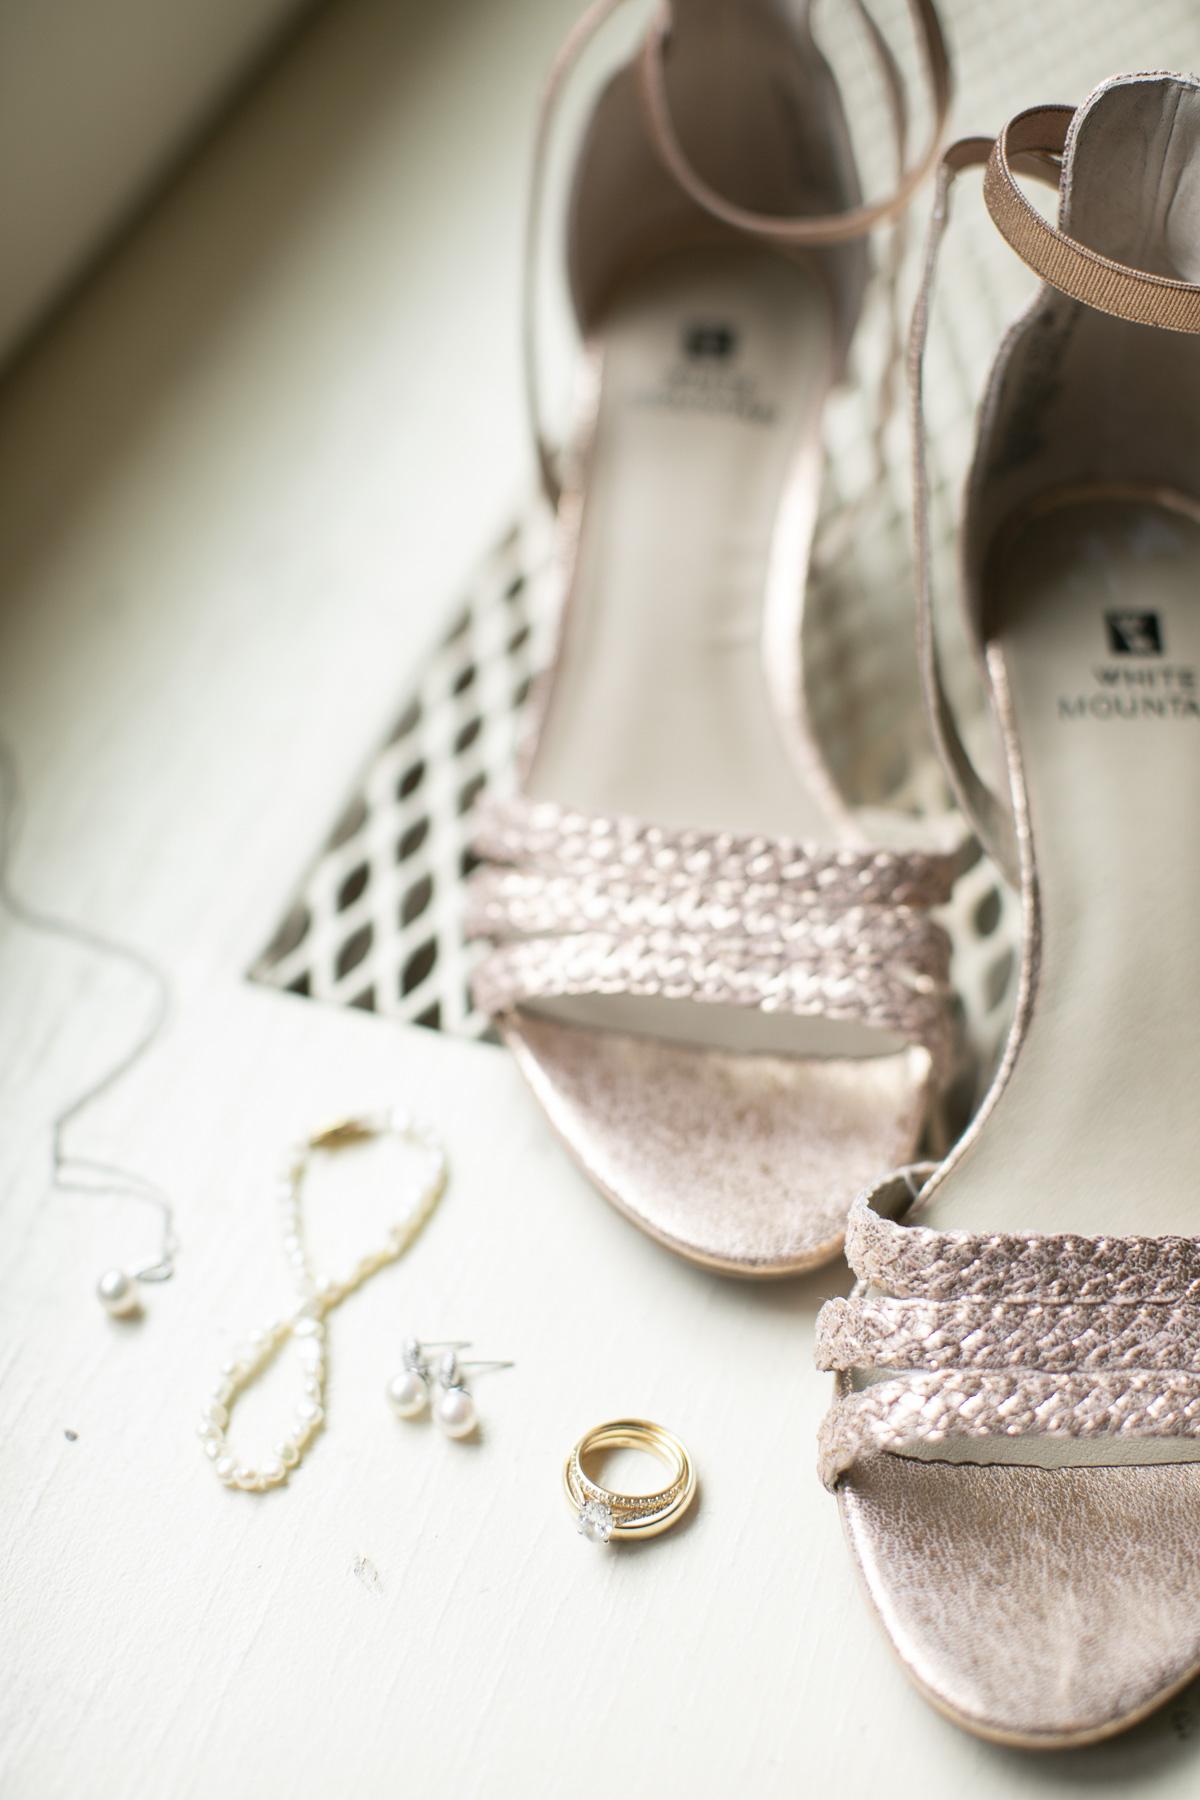 vineyard-bride-philosophy-studios-outdoor-summer-wedding-the-tamahaac-club-niagara-ancaster-toronto-vendor-0017.JPG